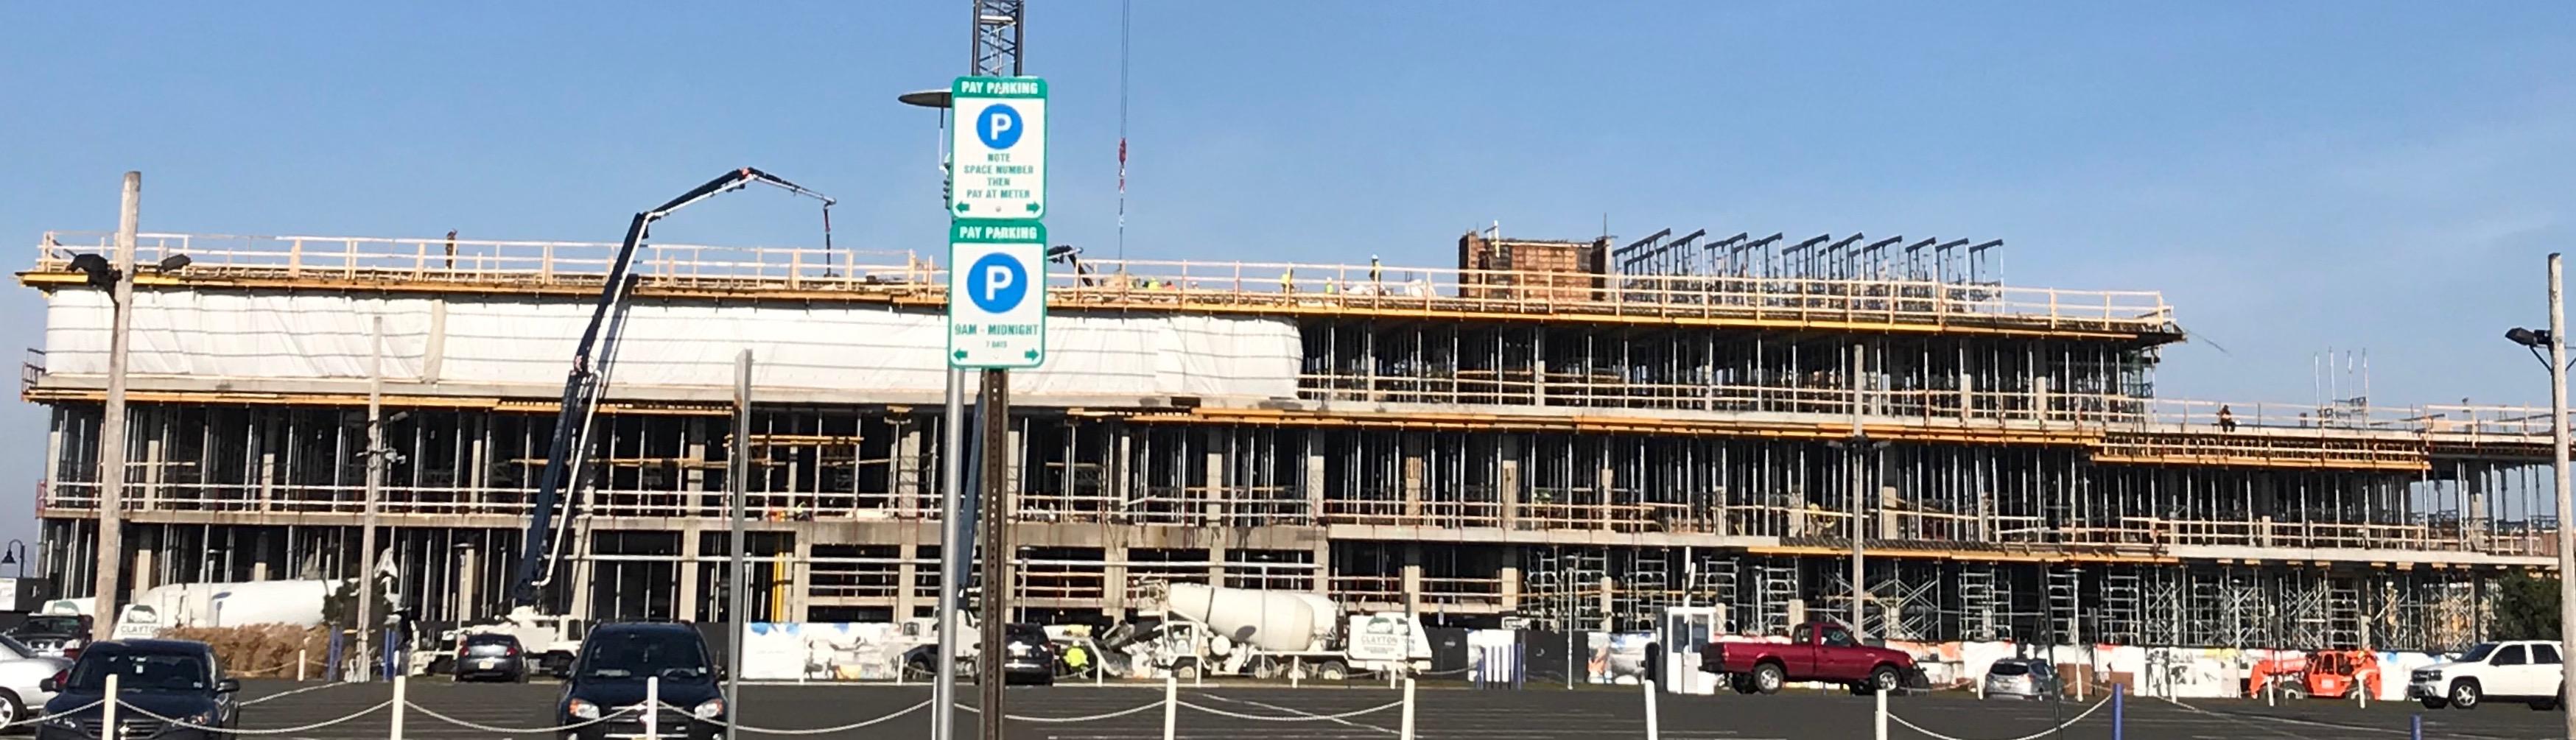 1110 Ocean Asbury Park Construction Dec 2017